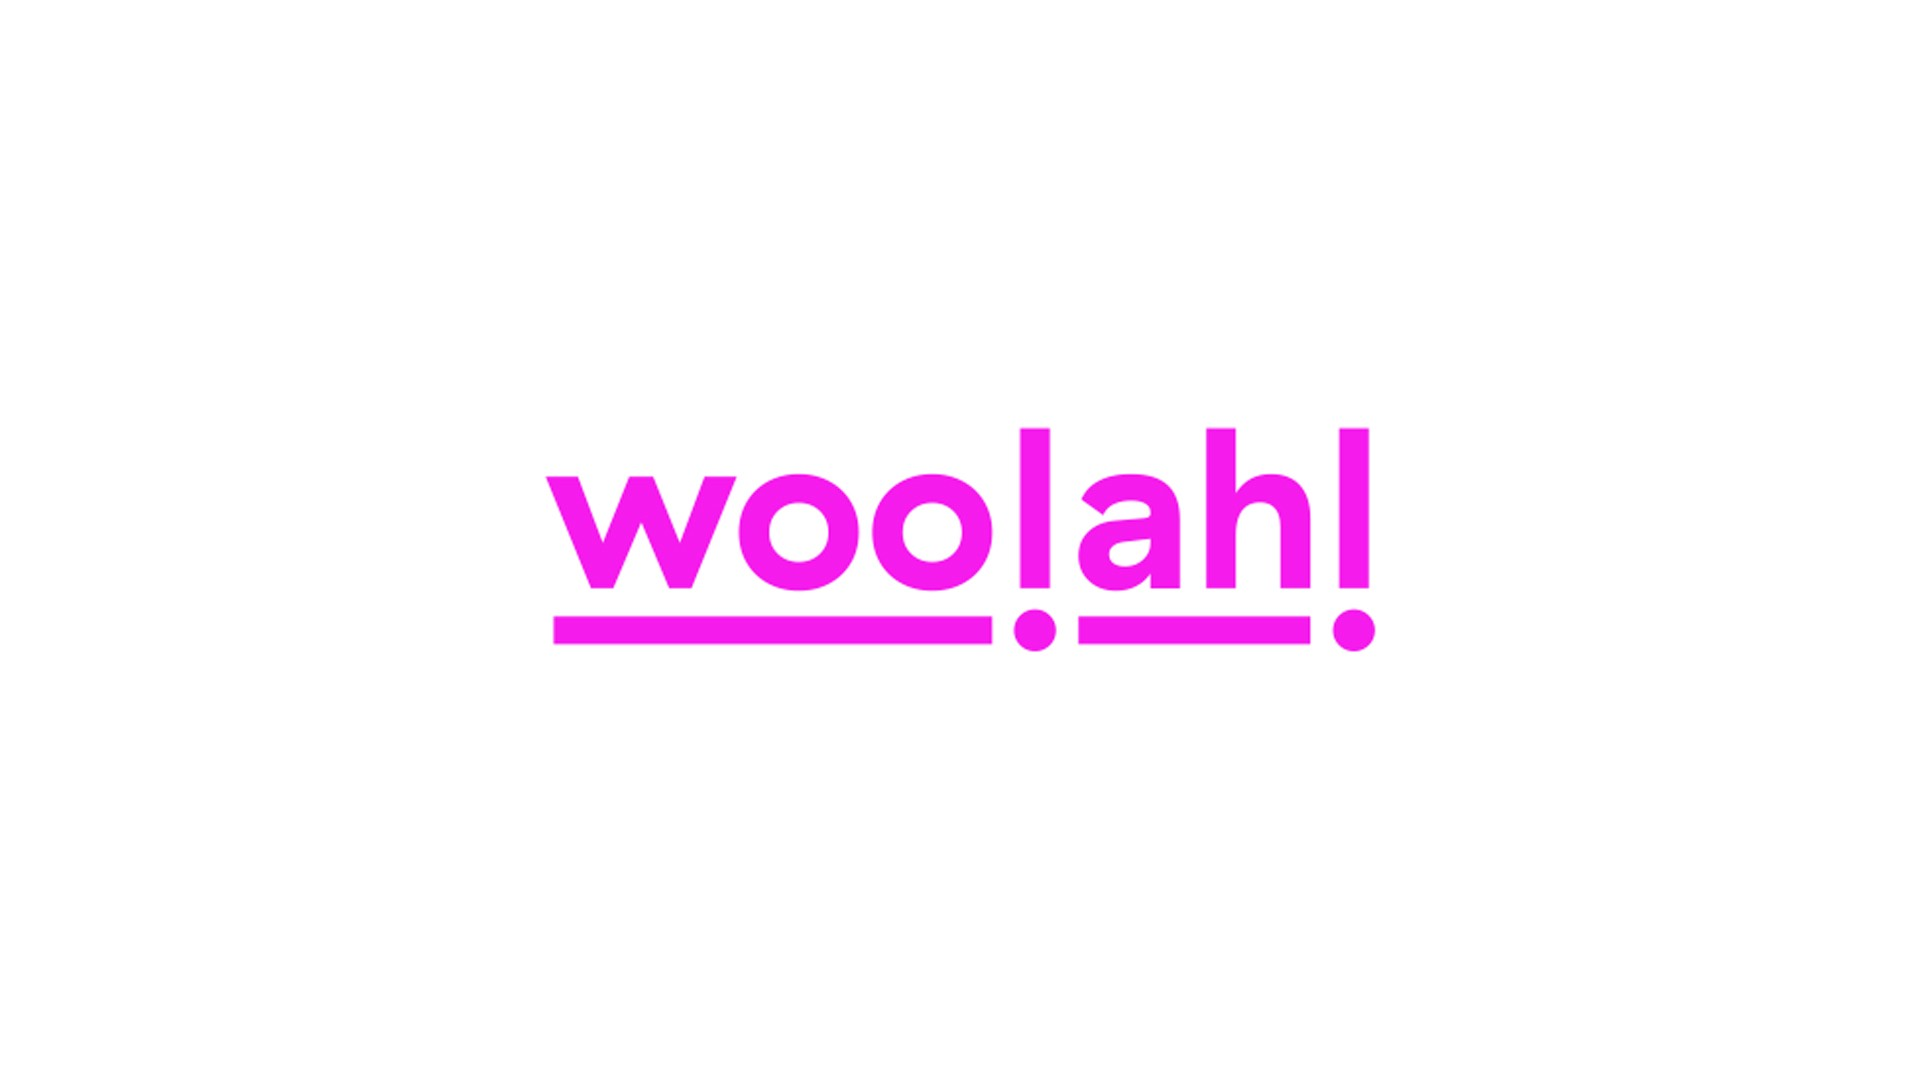 woo!ah! (우아!) Logo Variation Video